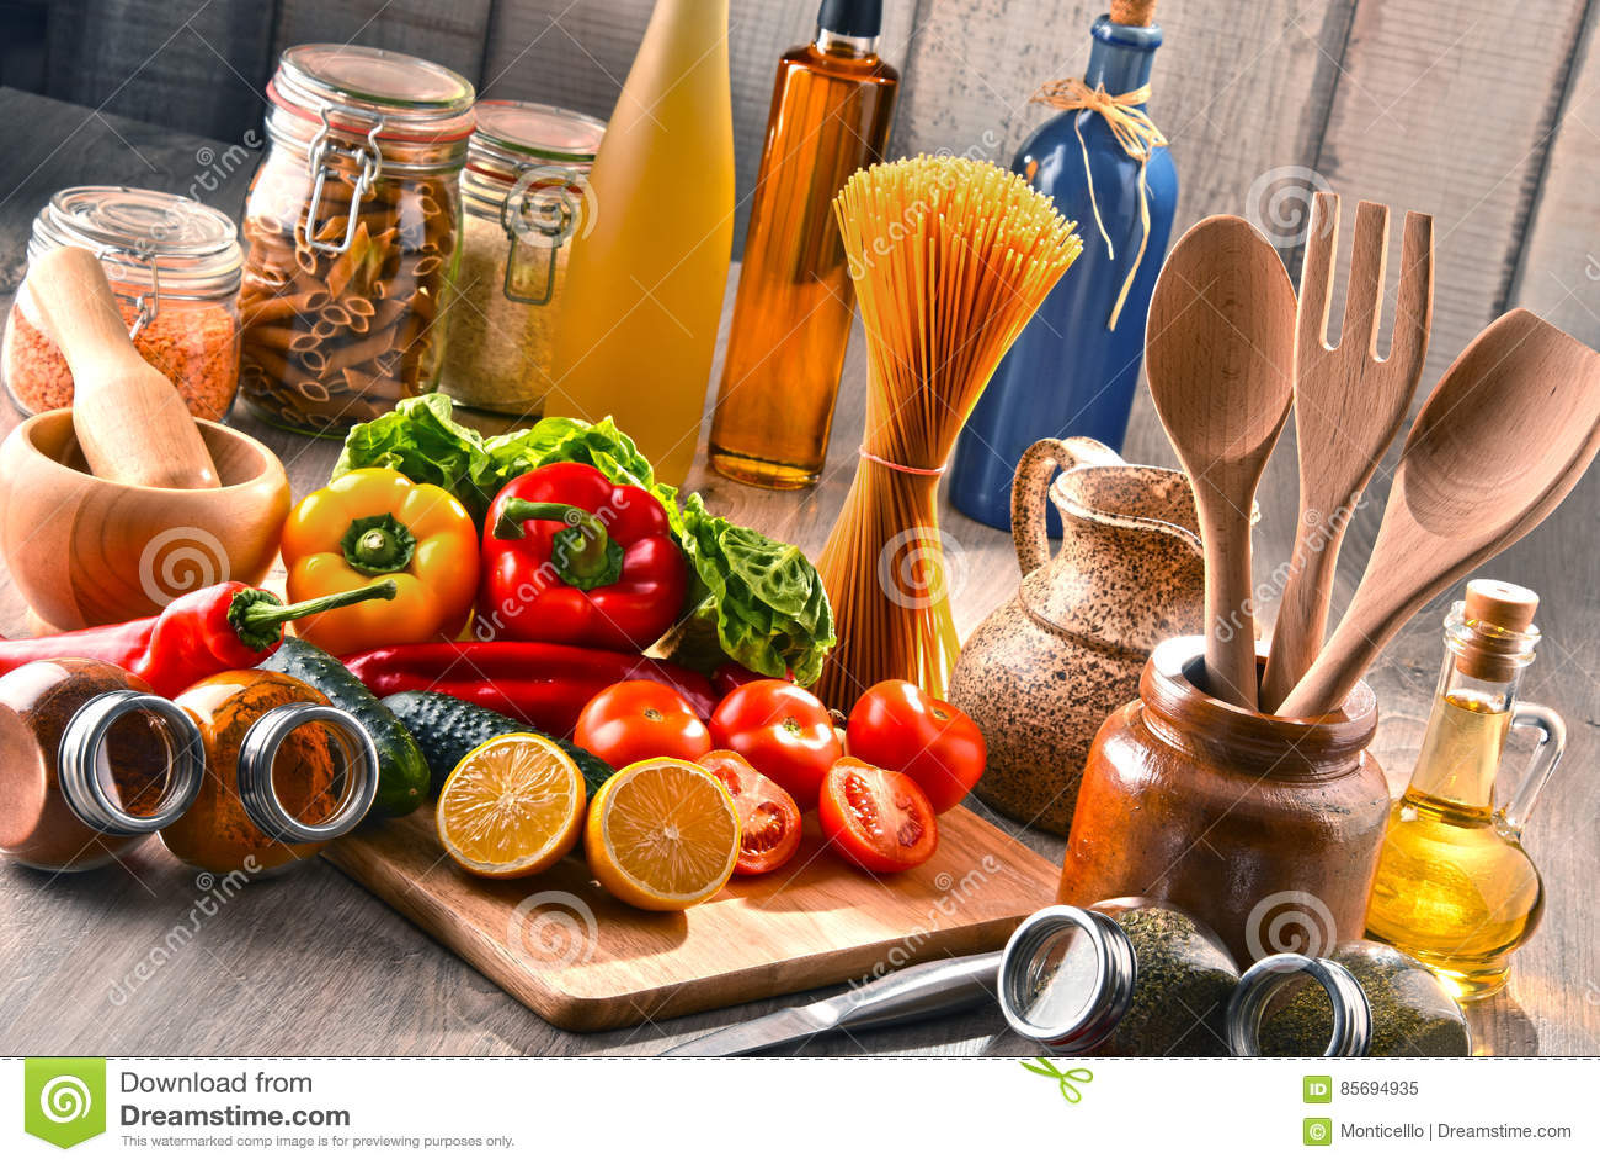 kitchen pantry ikea shelving 与被分类的食品和厨房器物的构成库存图片 图片包括有面条 烹调 养料 与被分类的食品和厨房器物的构成